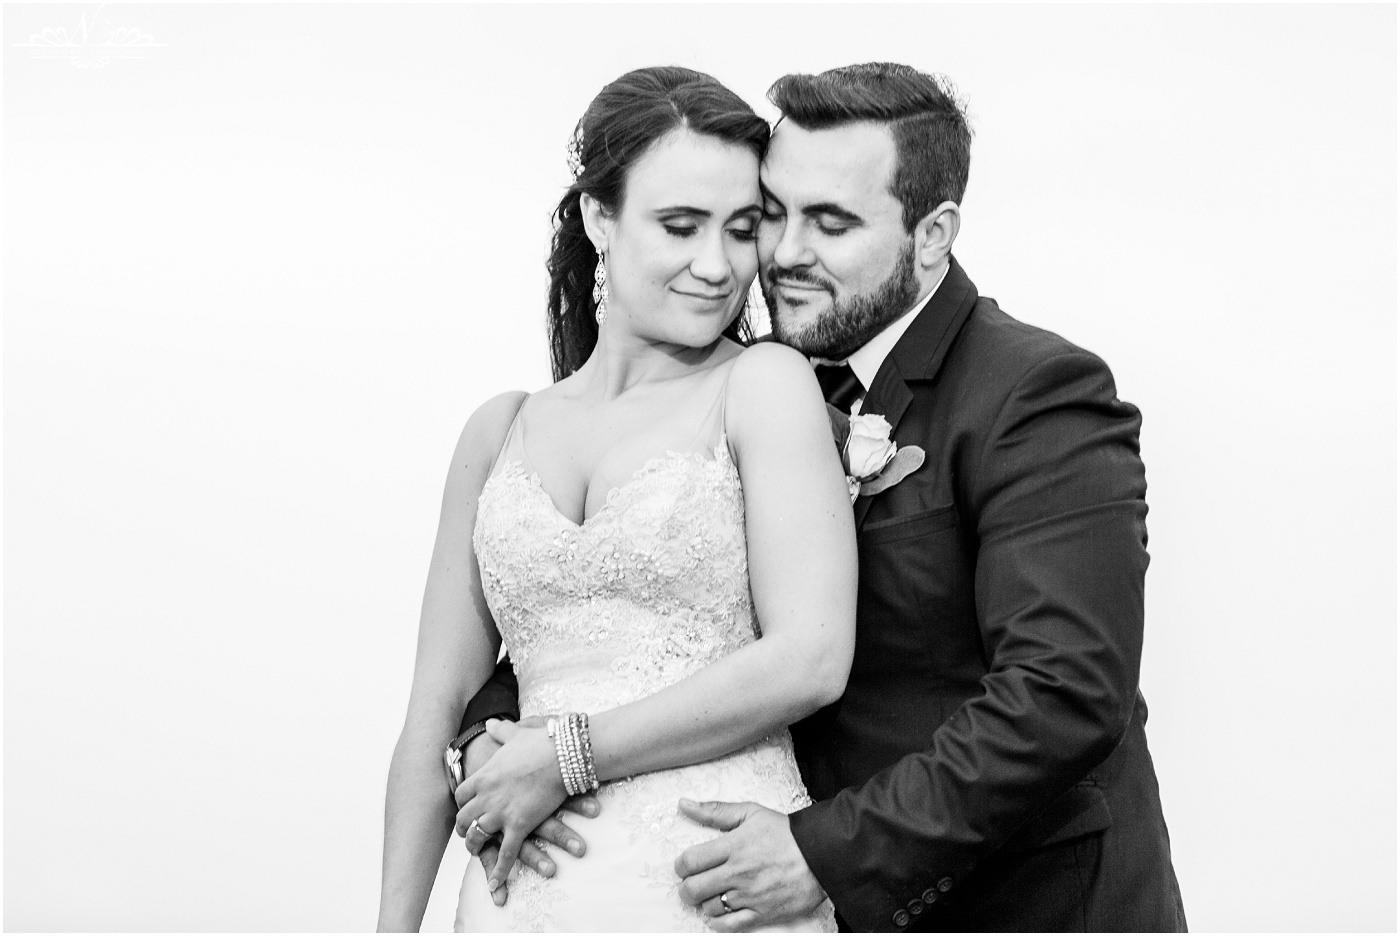 Eensgezind-Wedding-Photos-Nelis-Engelbrecht-Photography-124